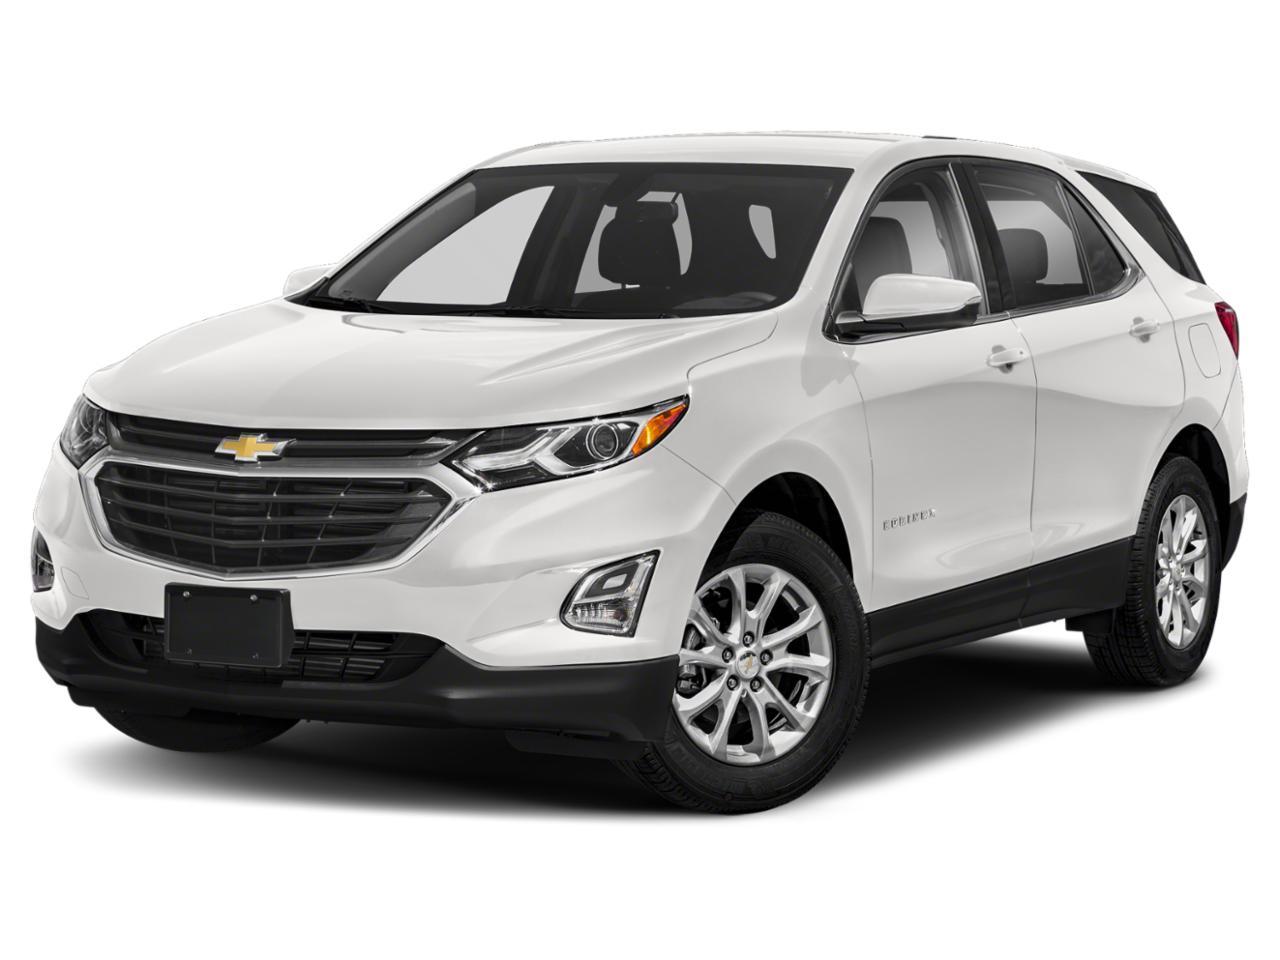 2021 Chevrolet Equinox Vehicle Photo in GREENSBORO, NC 27405-6904